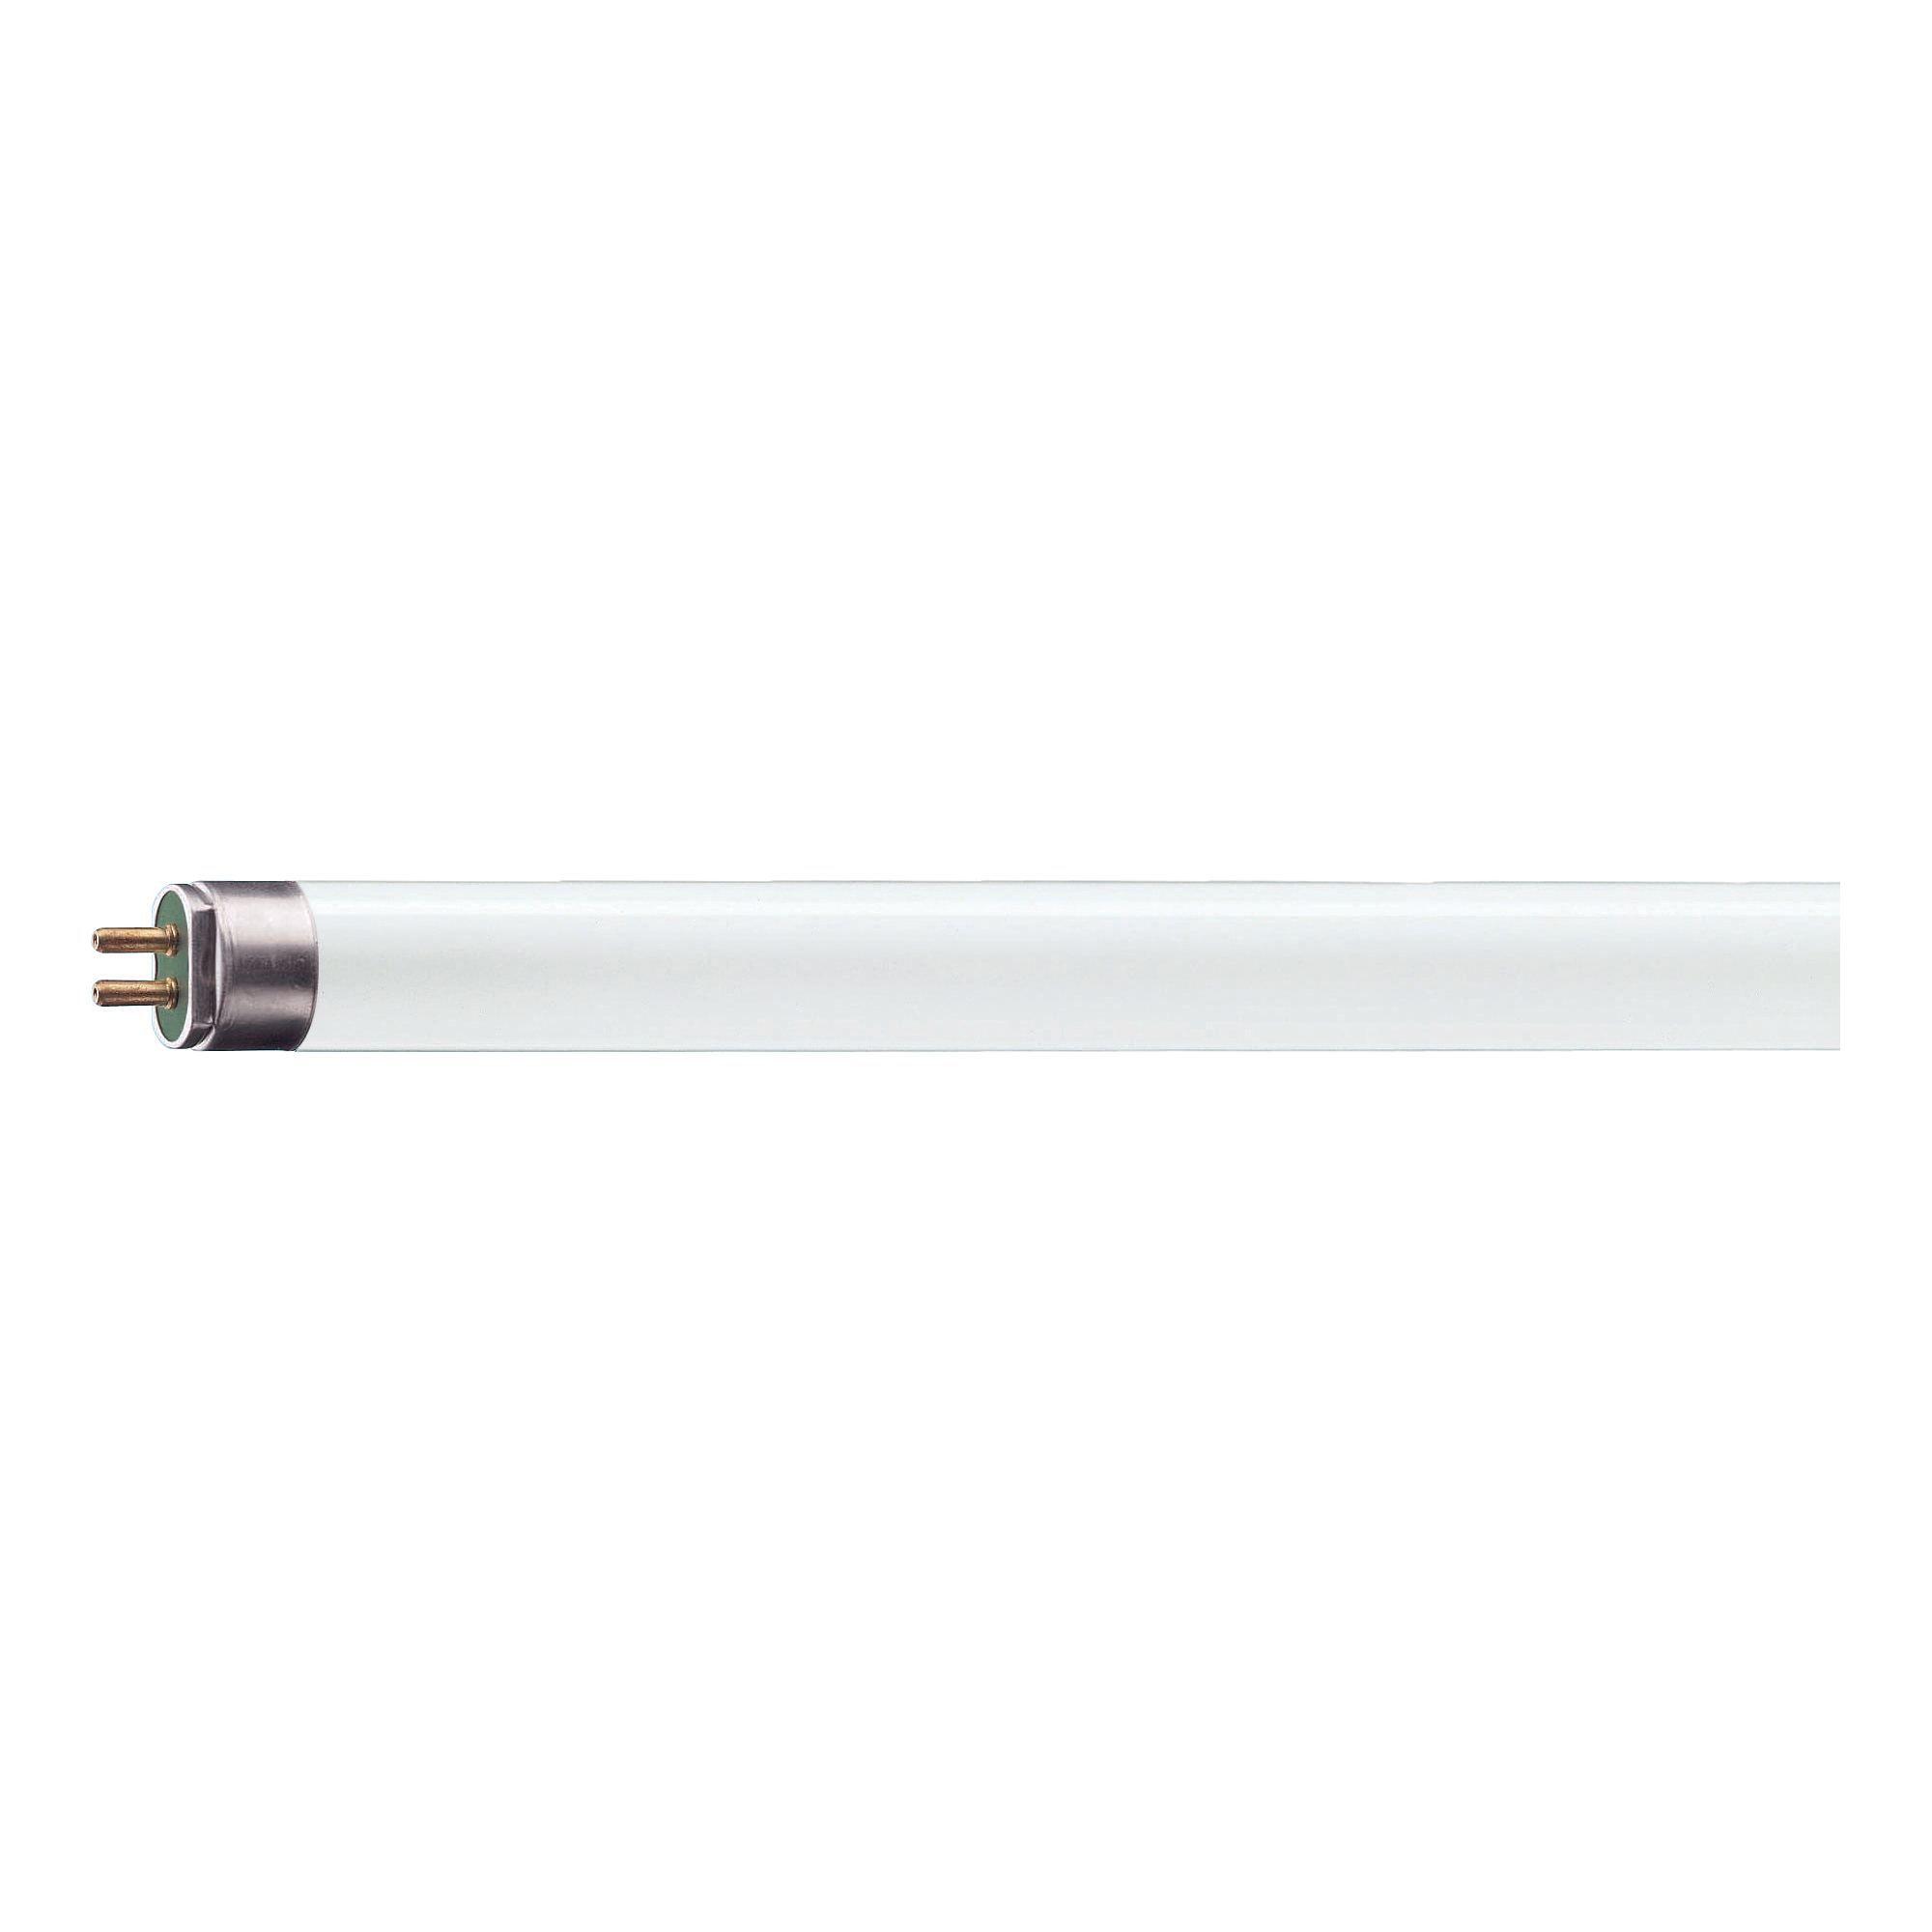 Купить Лампа люминесцентная Philips Master TL5 HE 21W/830 SLV/40 863мм 21Вт d16 G5 тепл